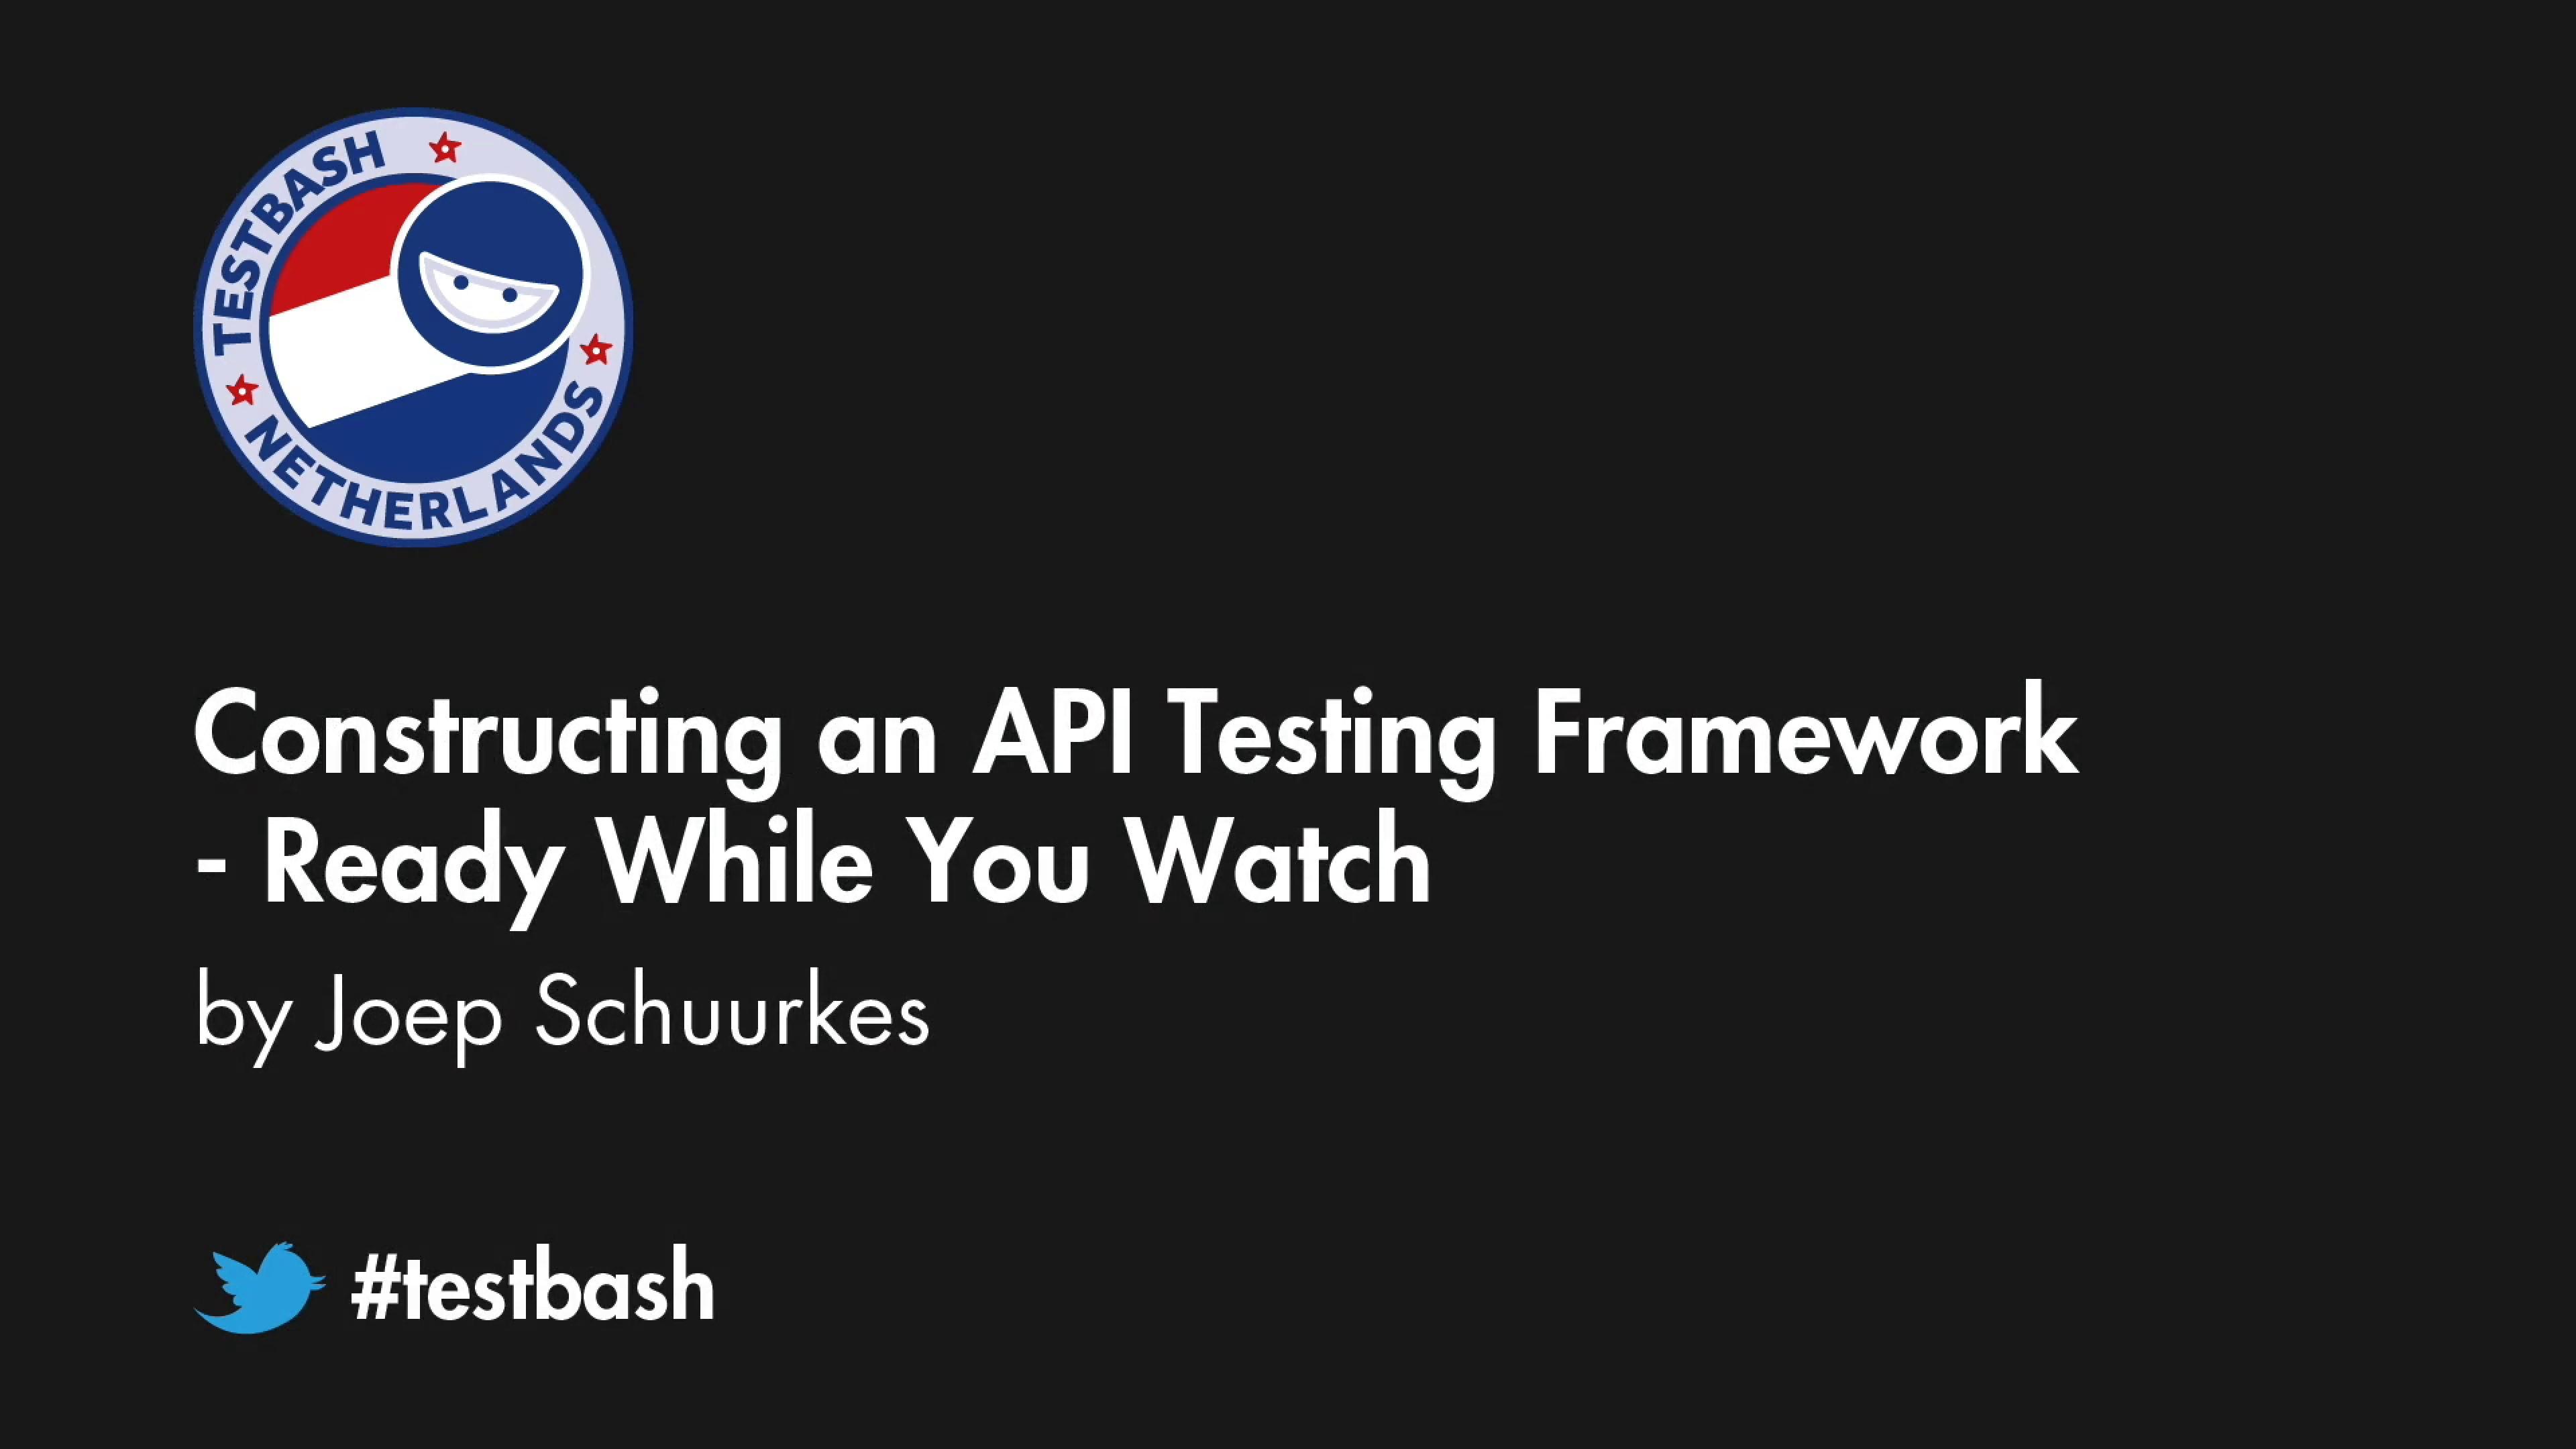 Constructing an API Testing Framework - Joep Schuurkes